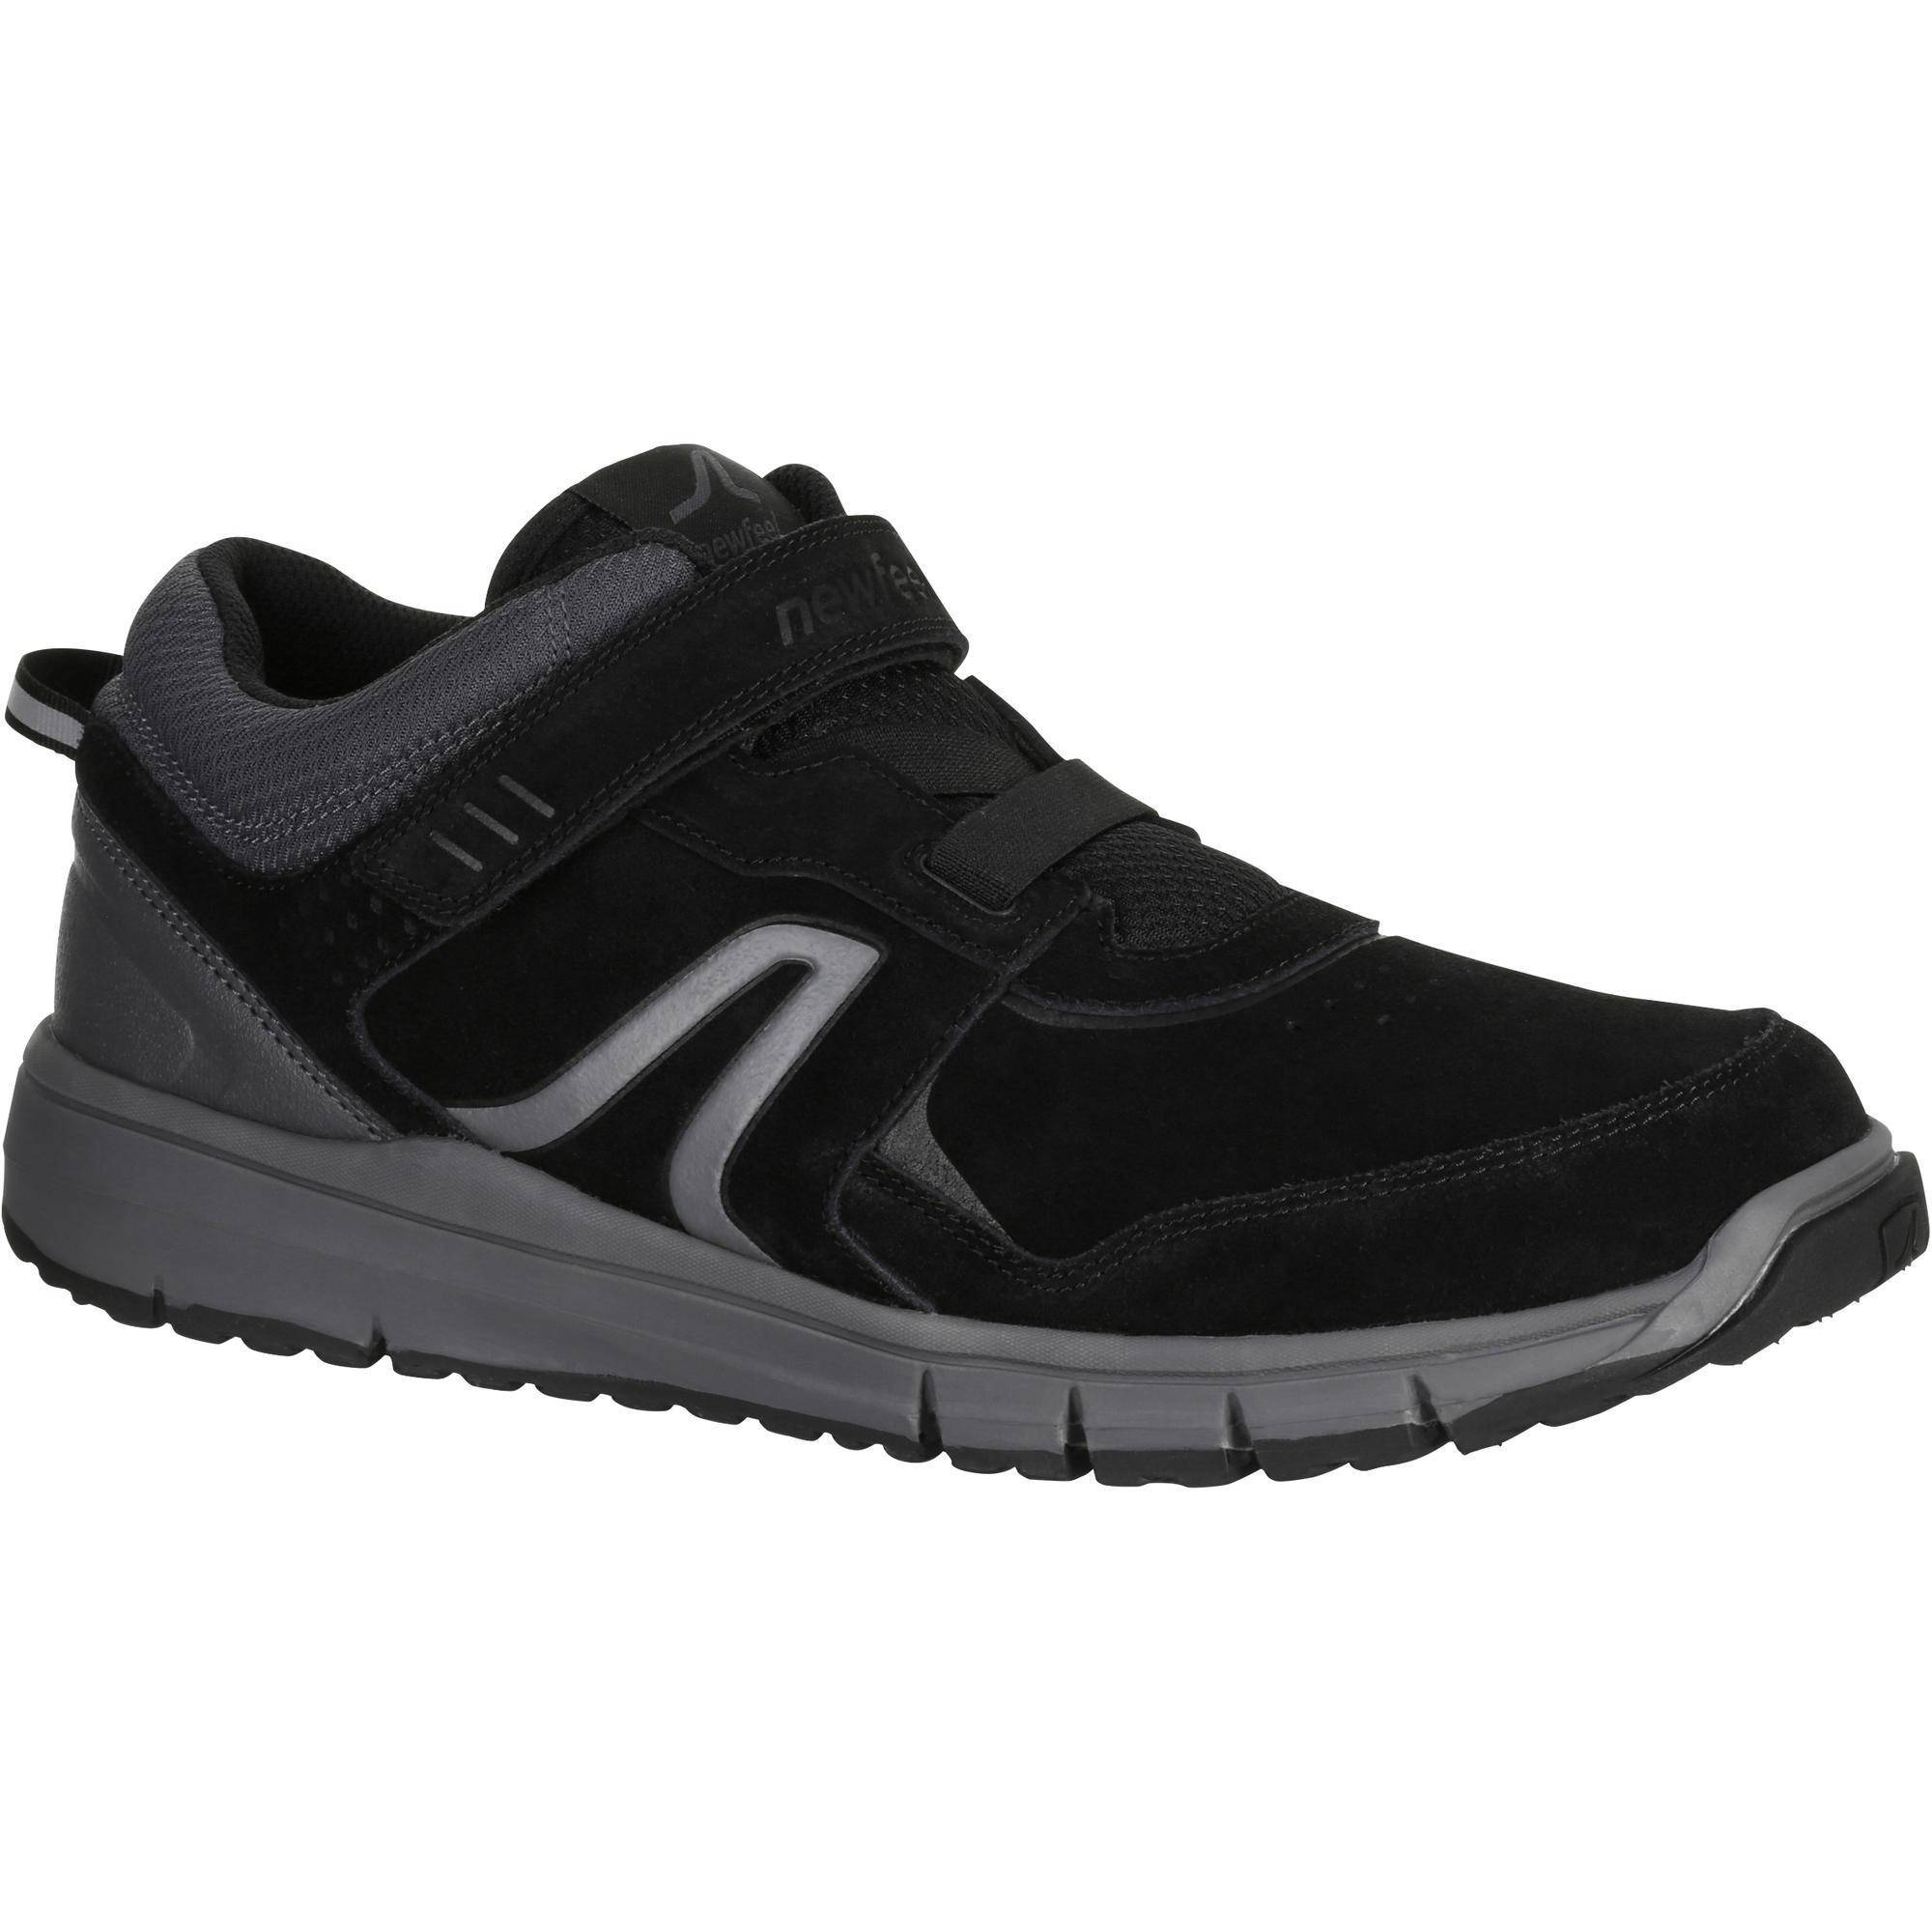 Newfeel Chaussures marche sportive homme HW 140 Strap cuir noir - Newfeel